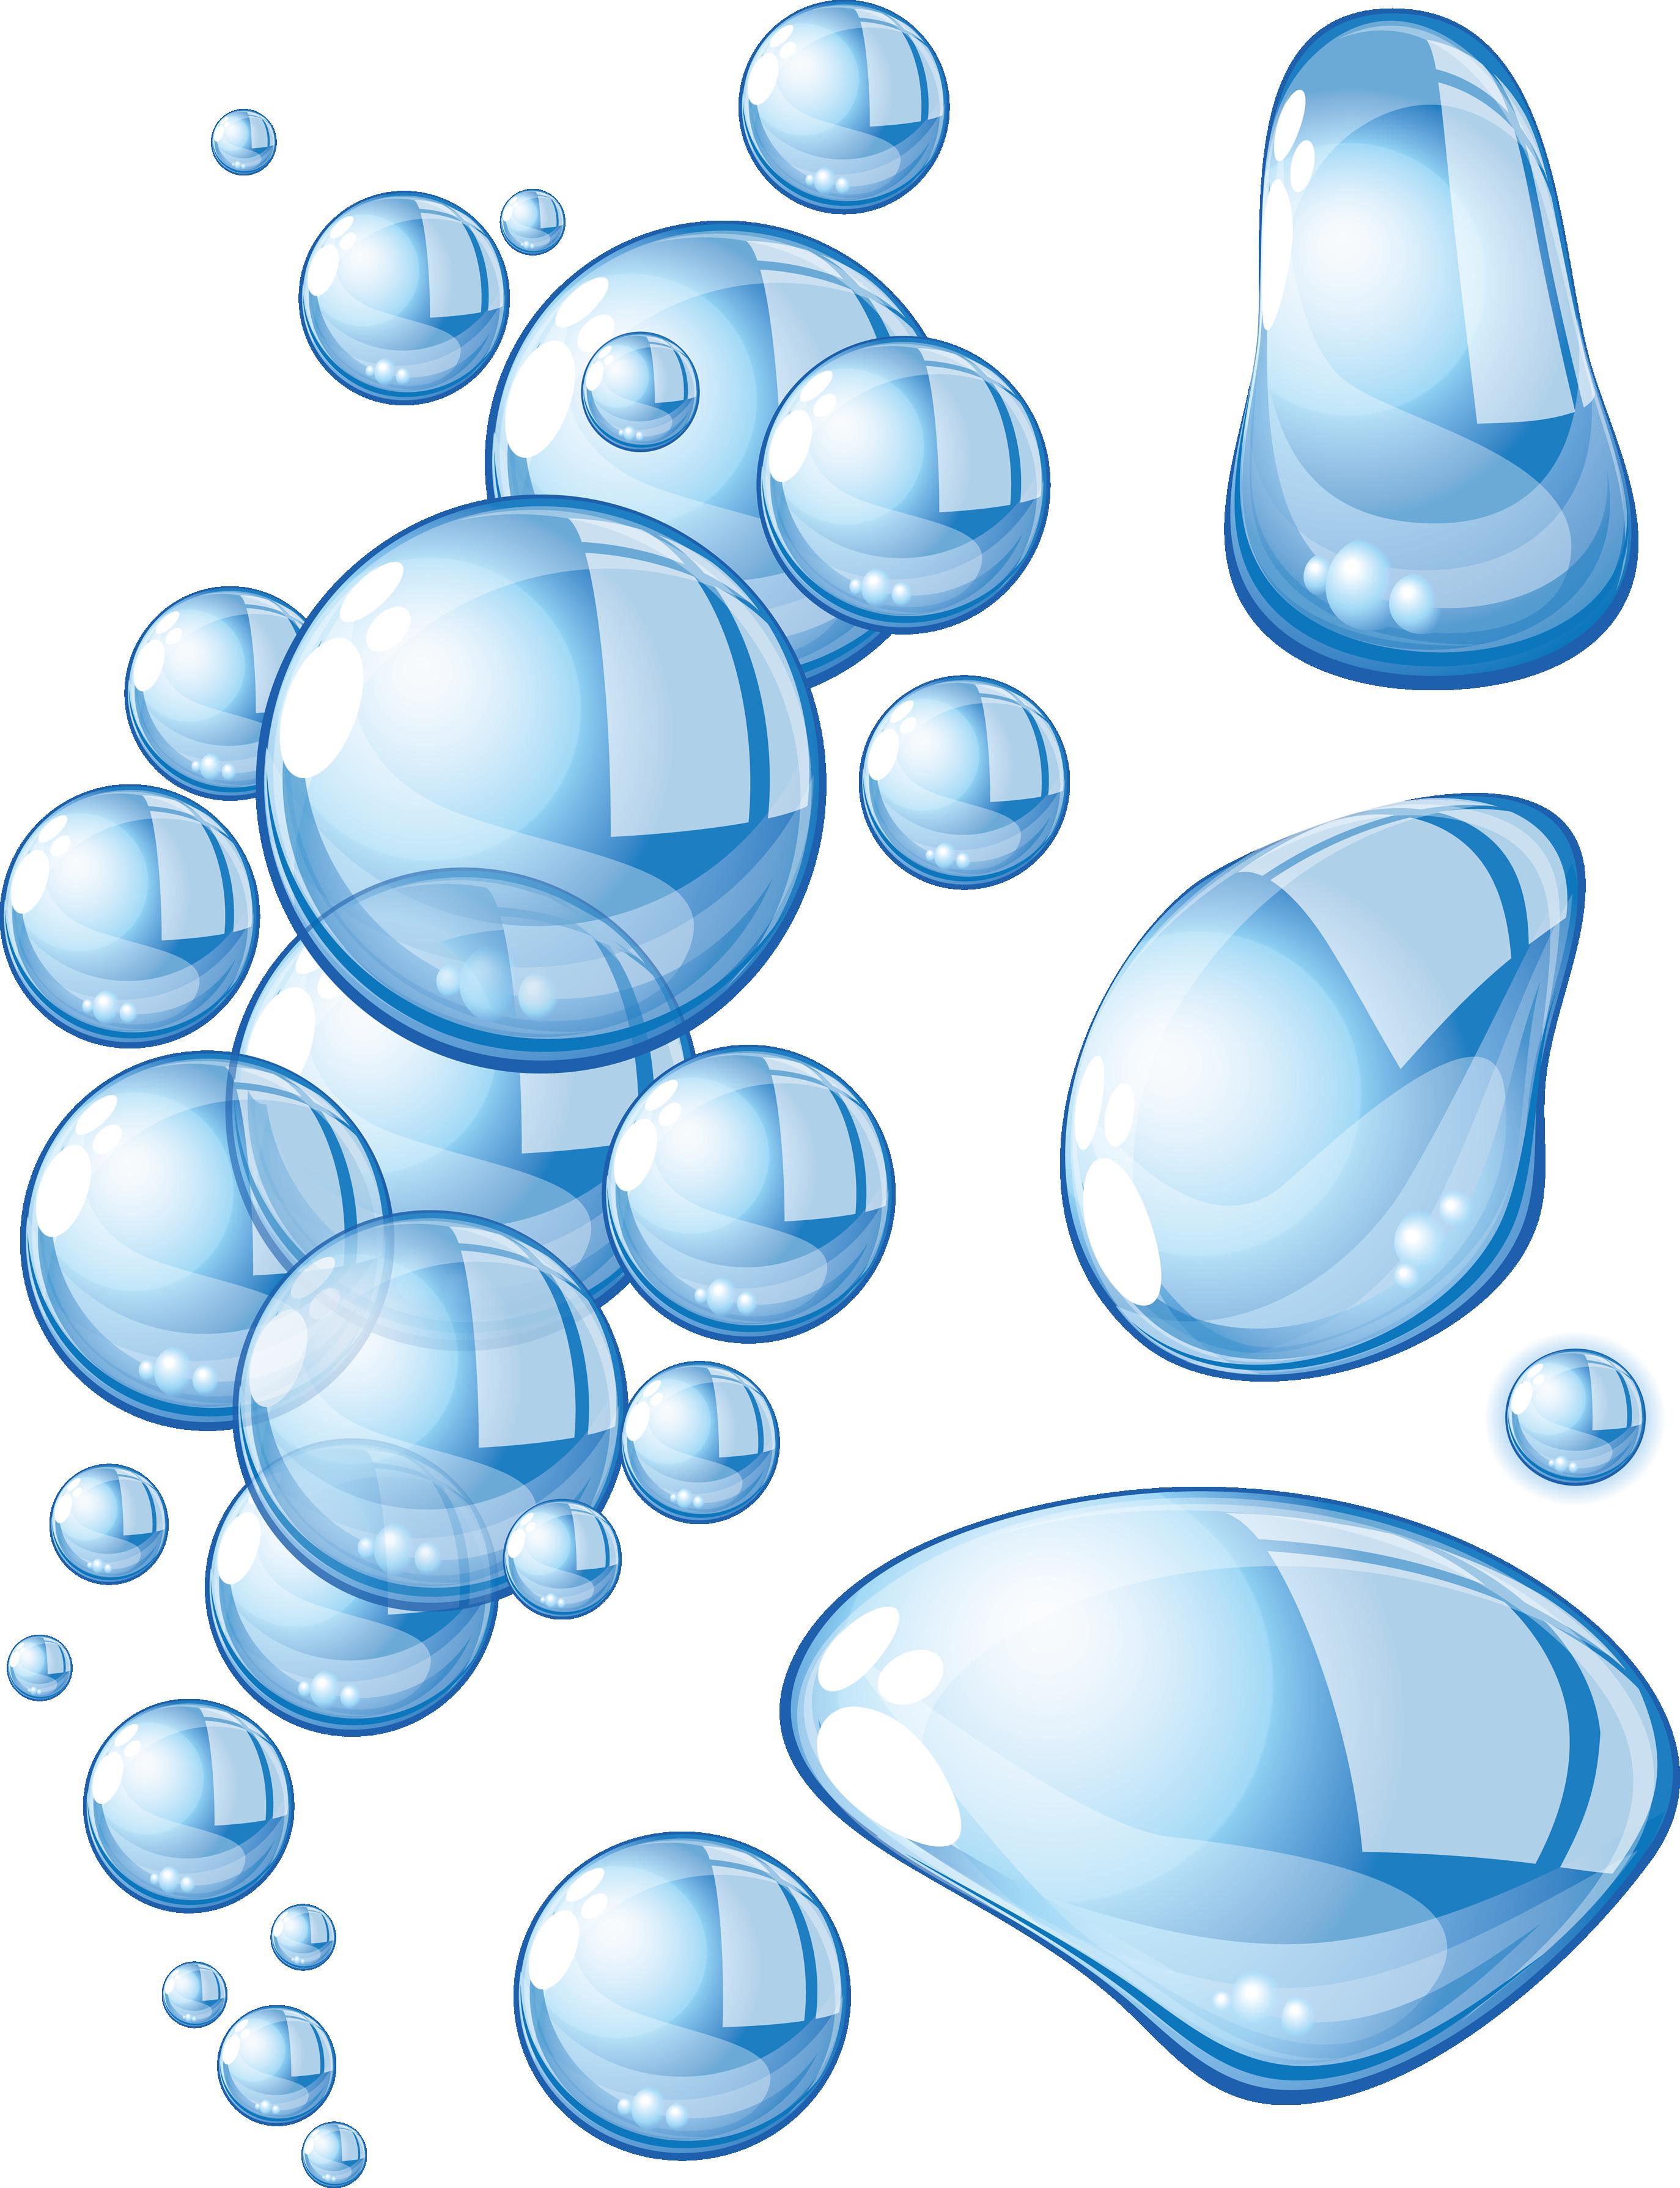 Pin By Hopeless On Secret Water Splash Png Bubble Drawing Water Bubbles